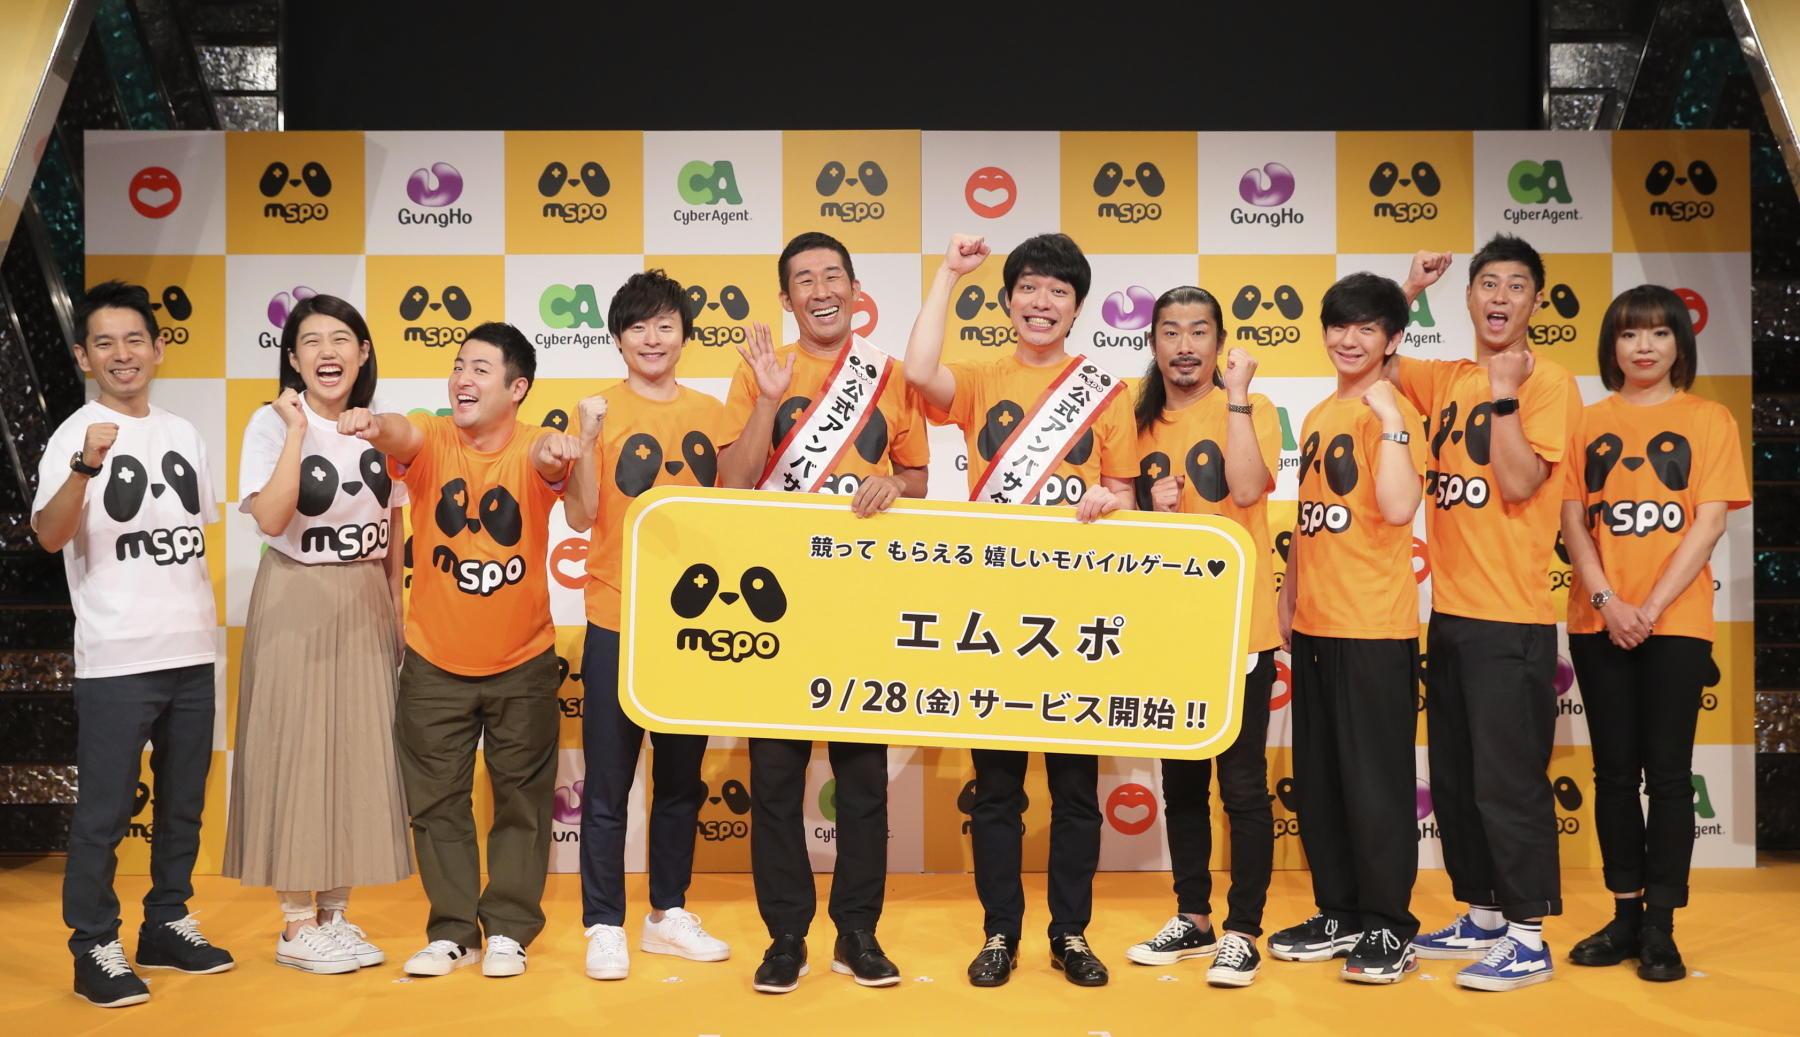 http://news.yoshimoto.co.jp/20180928163222-618ded18d7d825f1cc277123ffbafc980096eff9.jpg